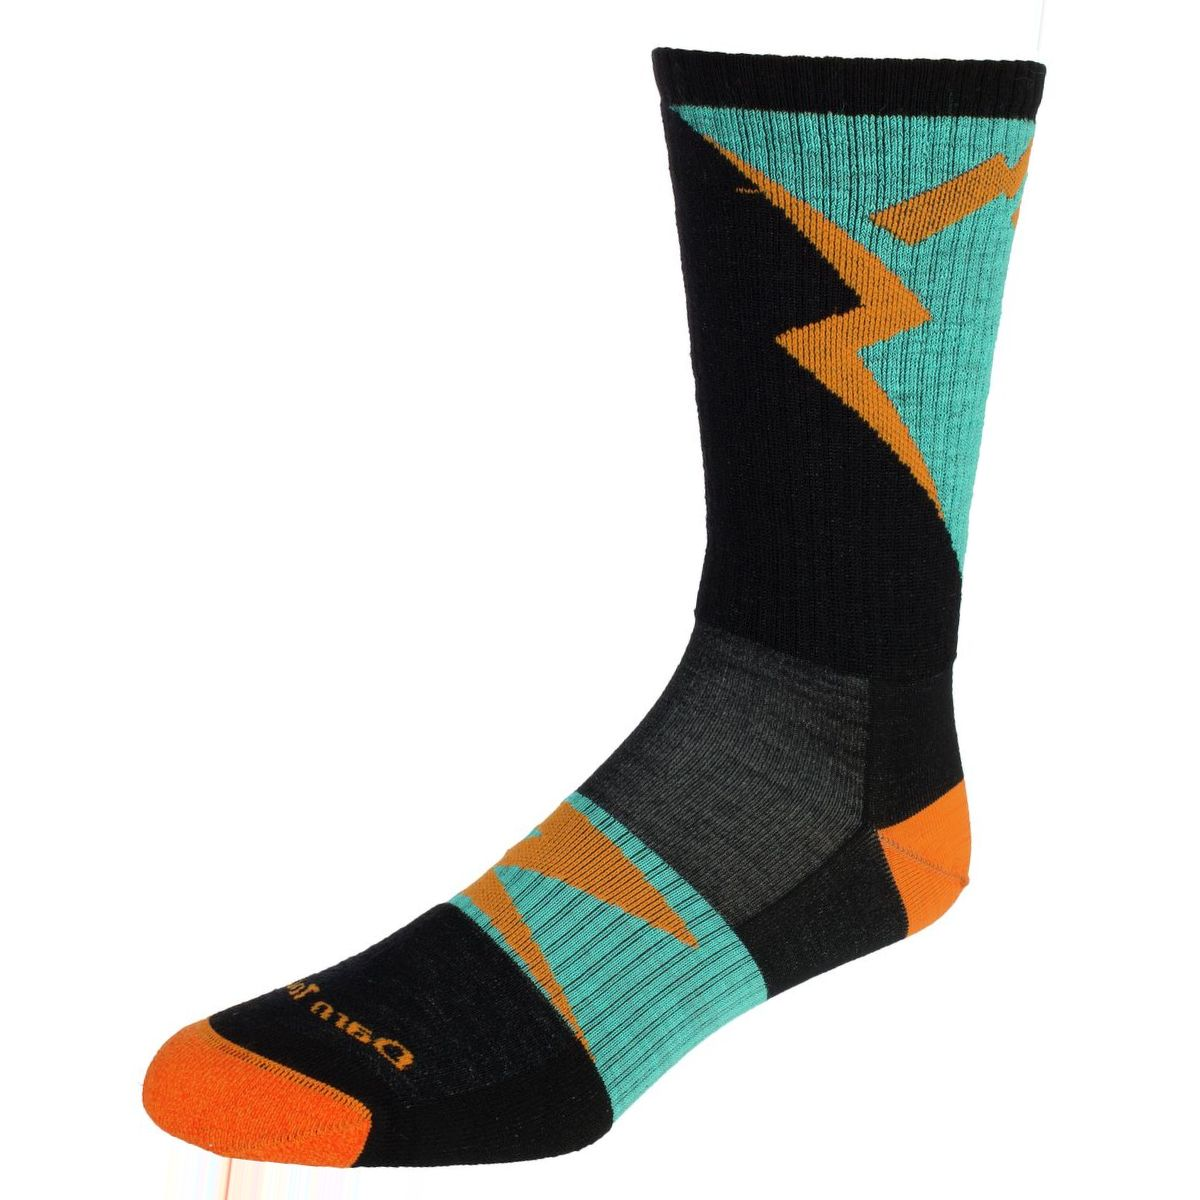 Darn Tough BA Barney Crew Ultra-Light Sock - Men's